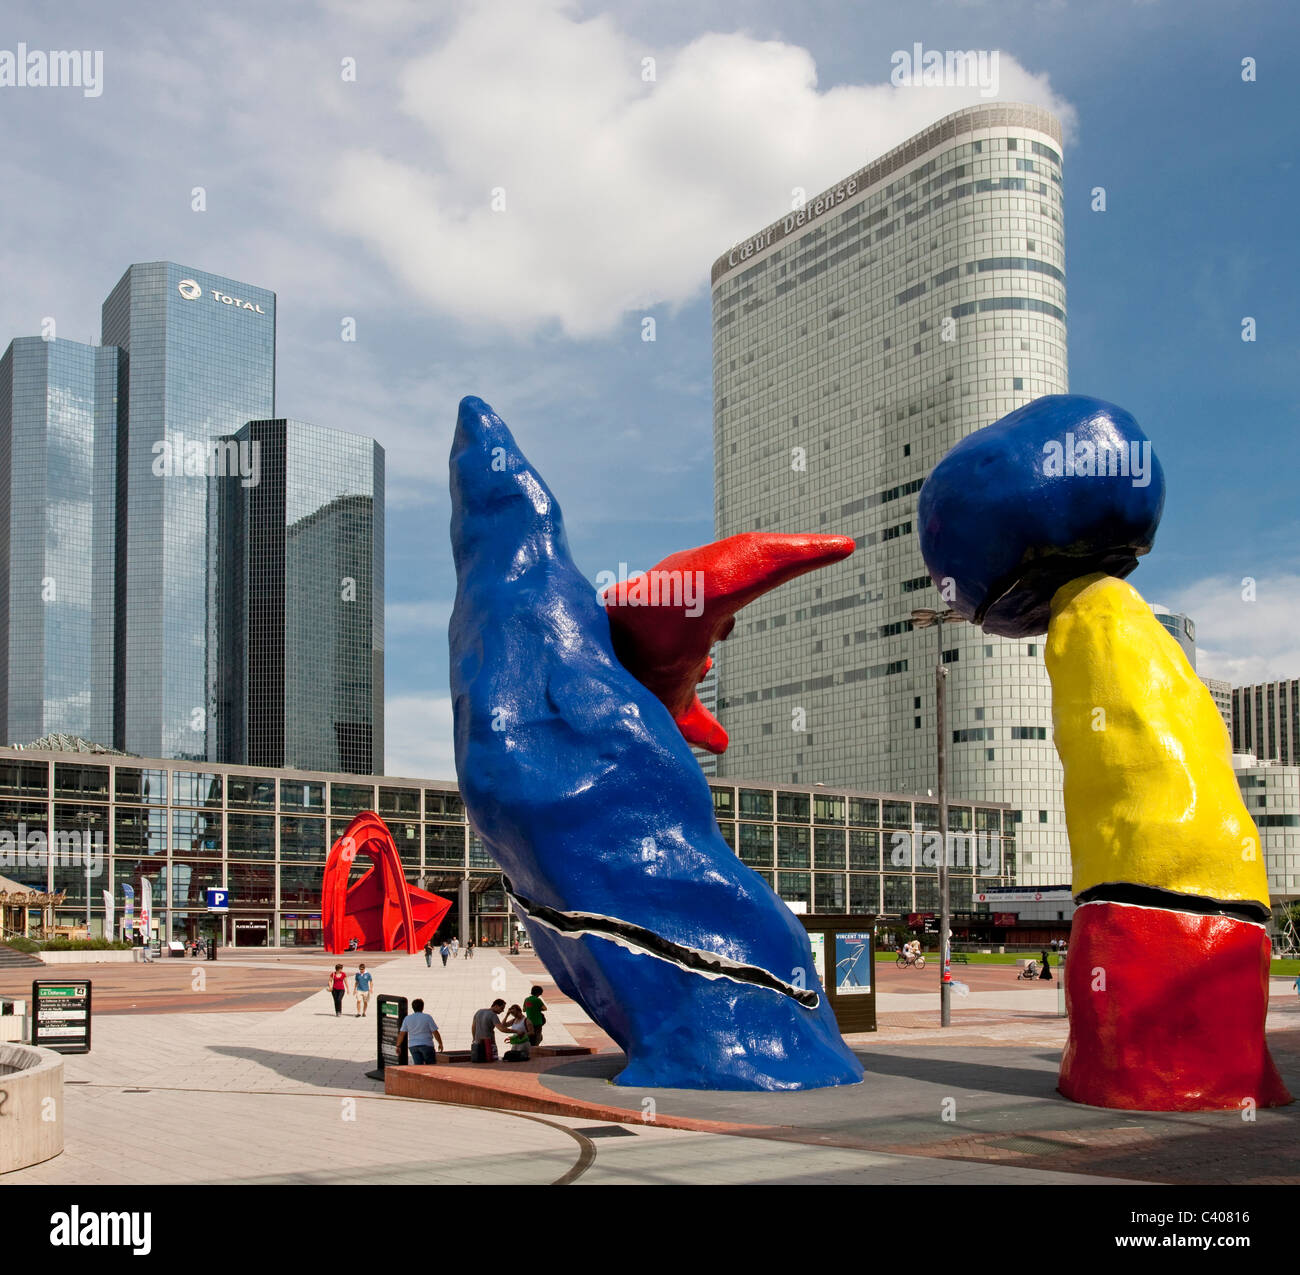 France, Europe, Paris, La Defense, Miro, sculpture, plastic, art, skill, colorfully - Stock Image